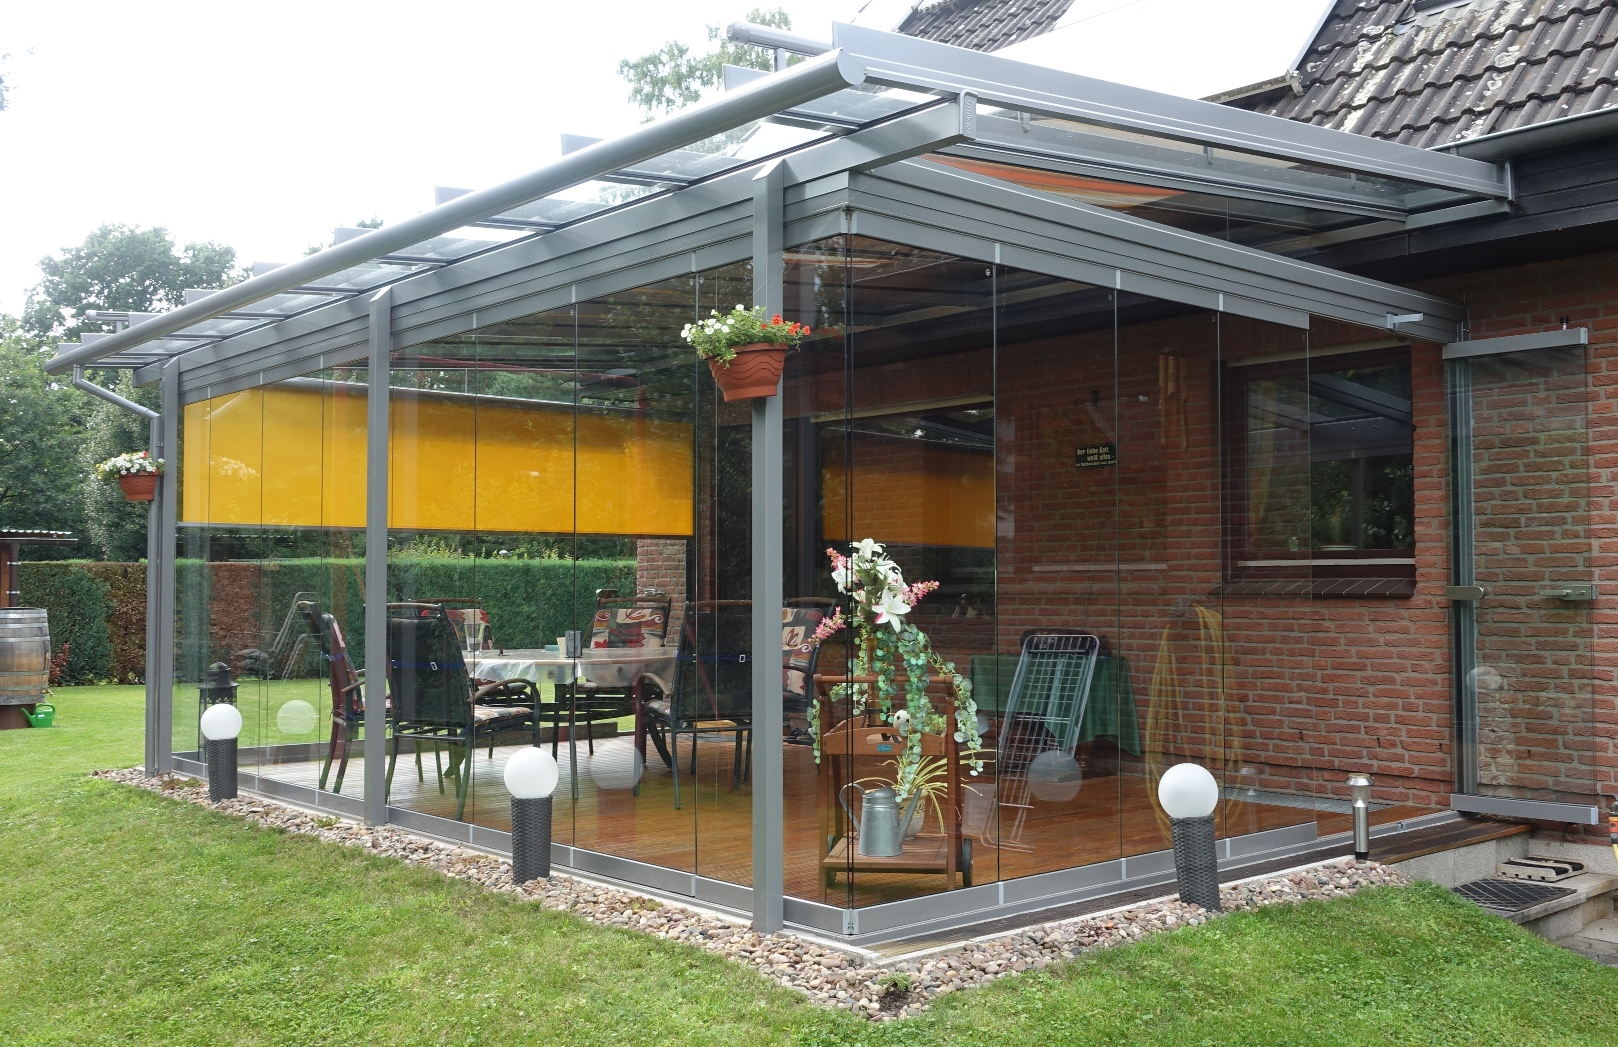 Solarlux Glashaus Atrium mit SL25 Unterbau